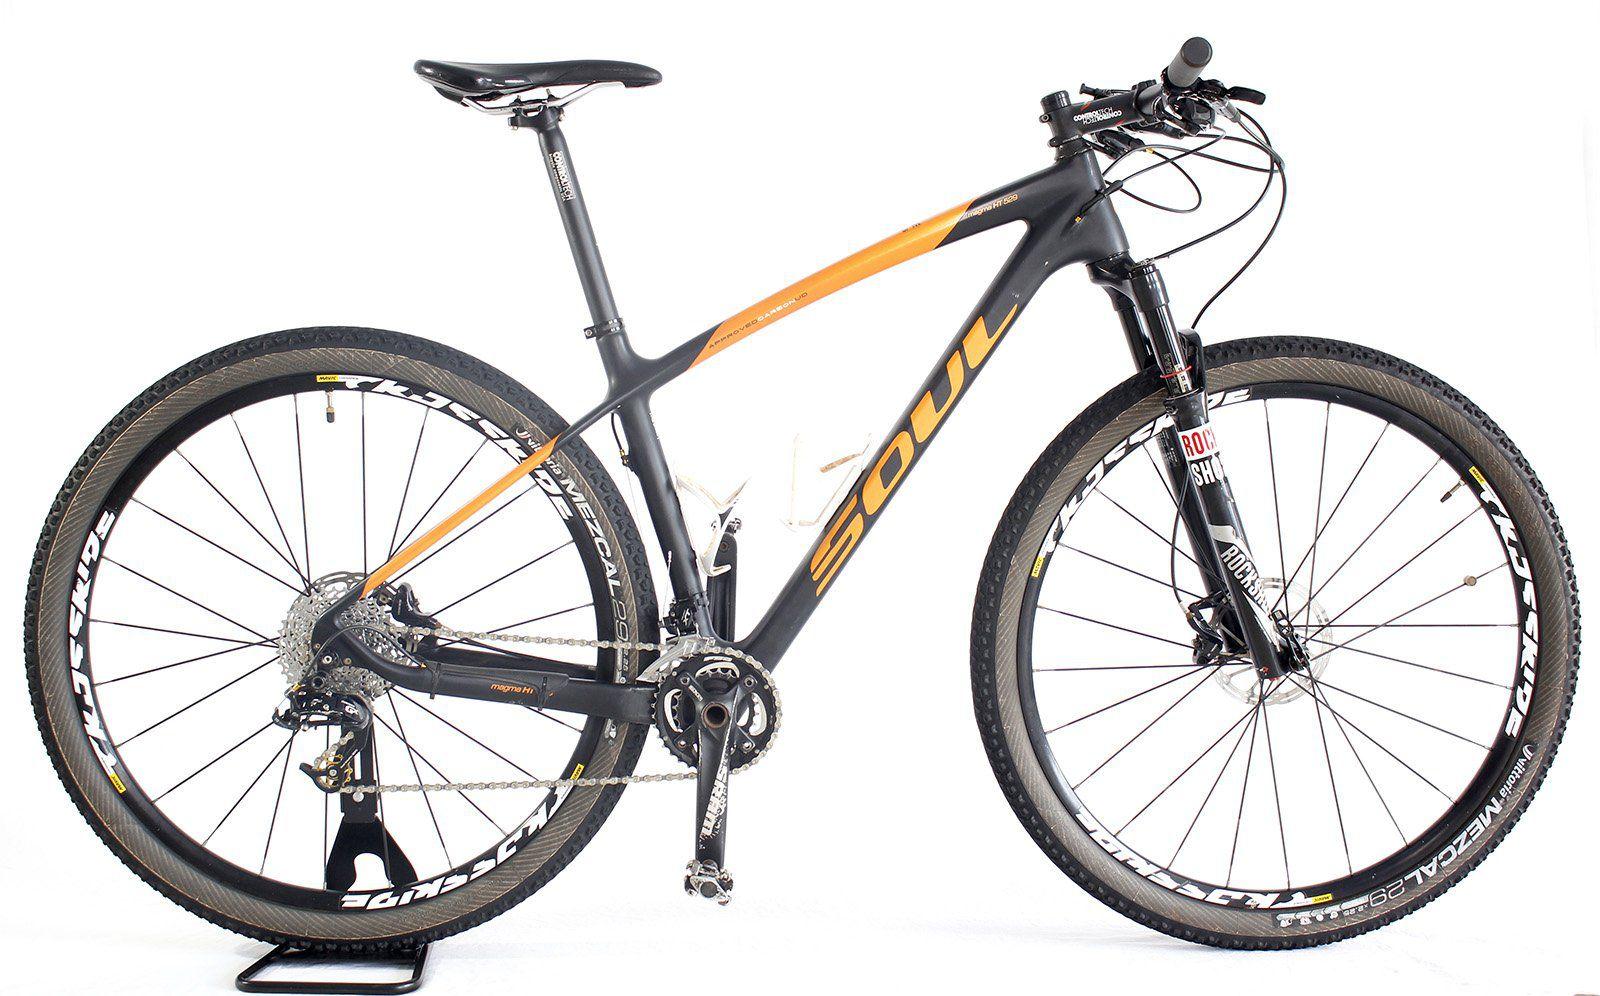 Bicicleta Aro 29 Soul Magma HT 529 Carbono Sram GX Reba ( semi nova )